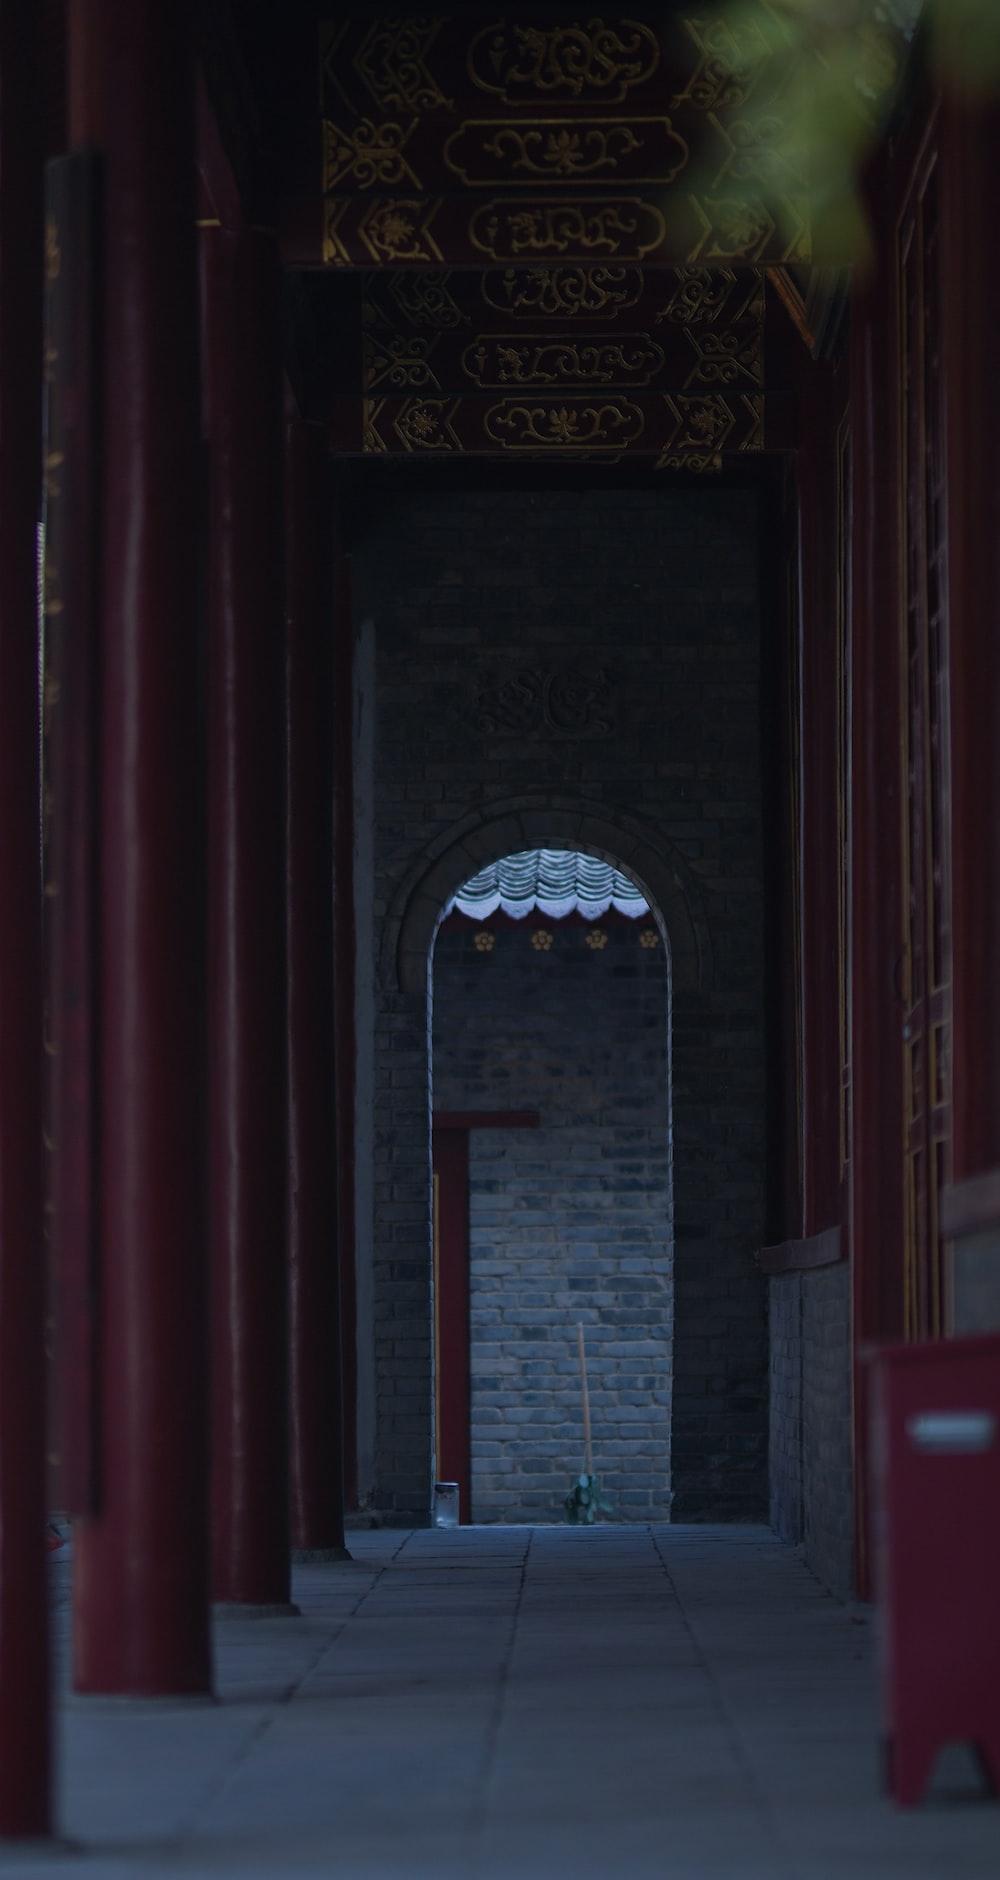 gray building archway